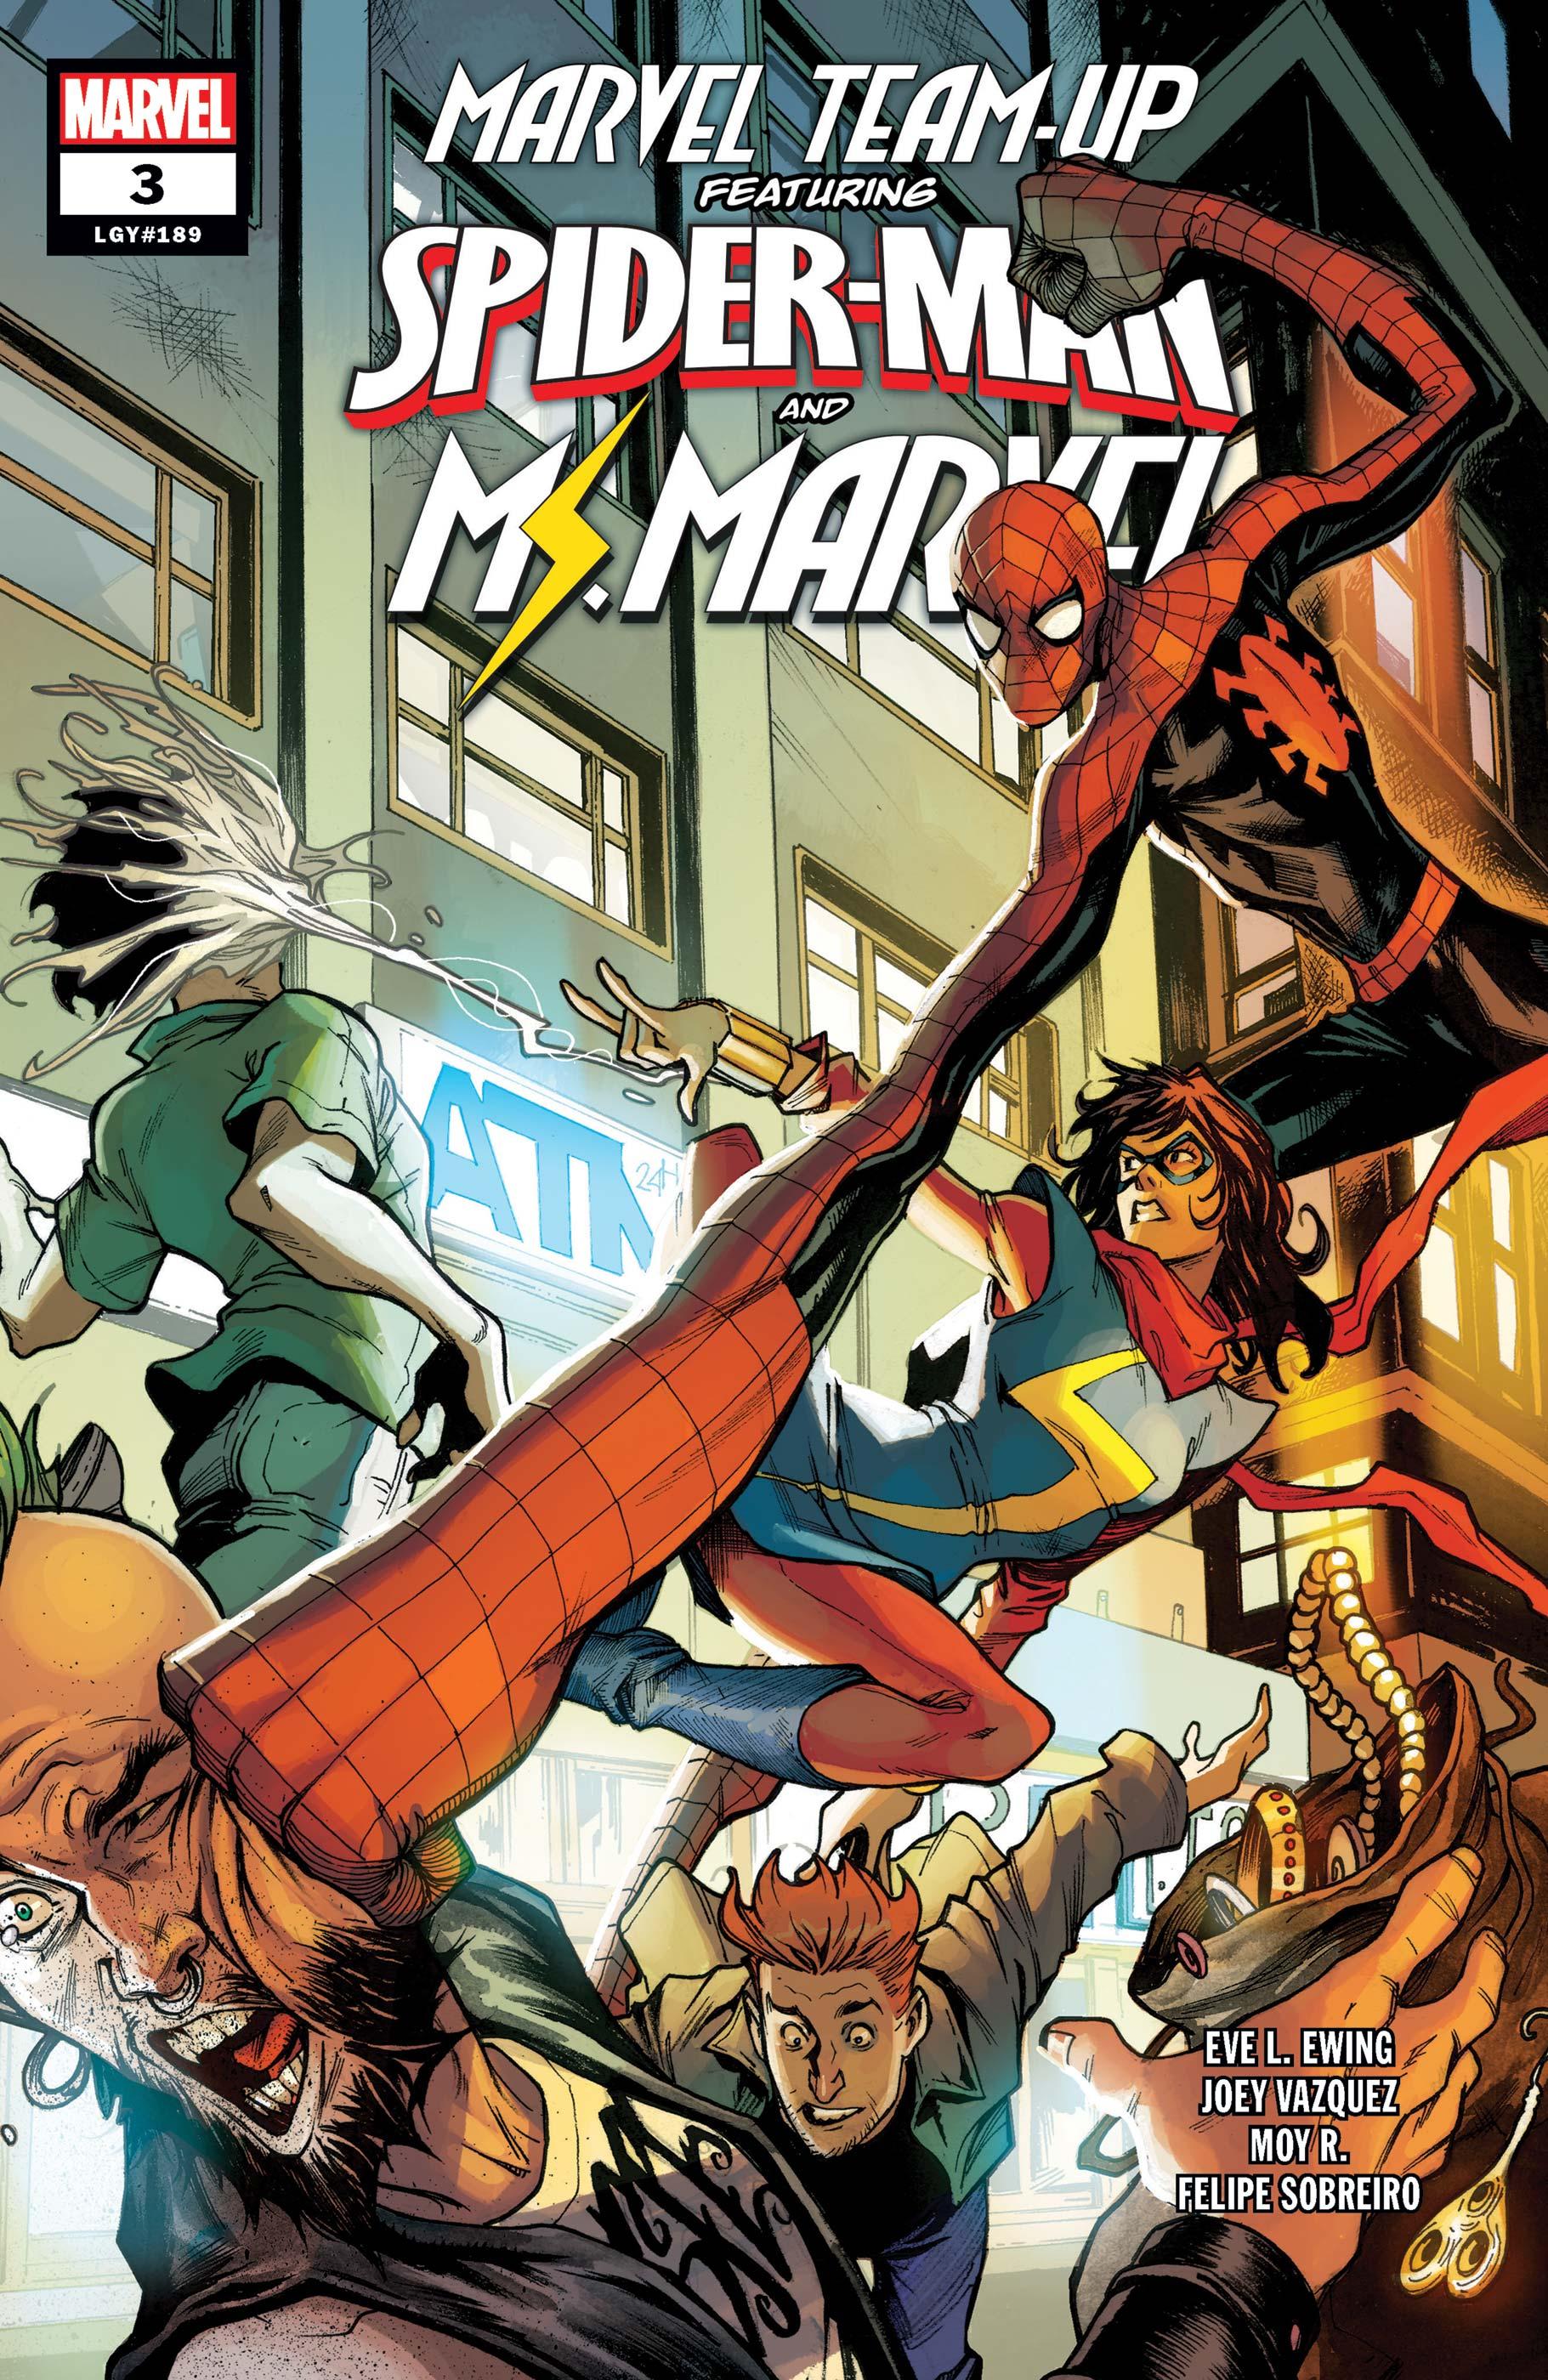 Marvel Team-Up (2019) #3